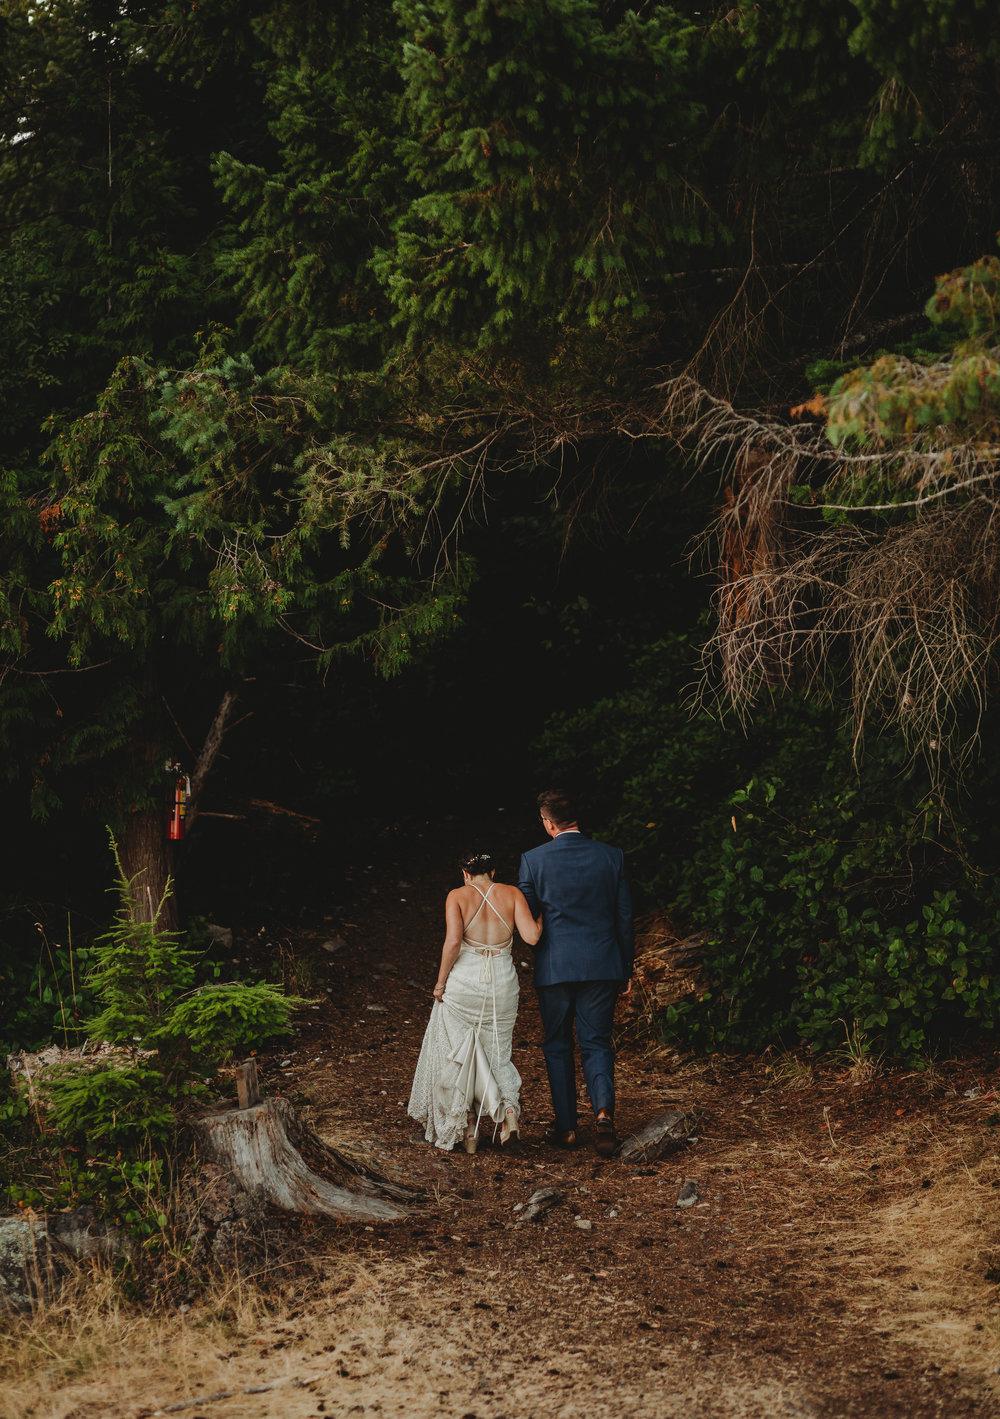 Camp Fircom Wedding - Vancouver Wedding Photographer & Videographer - Sunshine Coast Wedding Photos - Sunshine Coast Wedding Photographer - Jennifer Picard Photography - IMG_2611.jpg